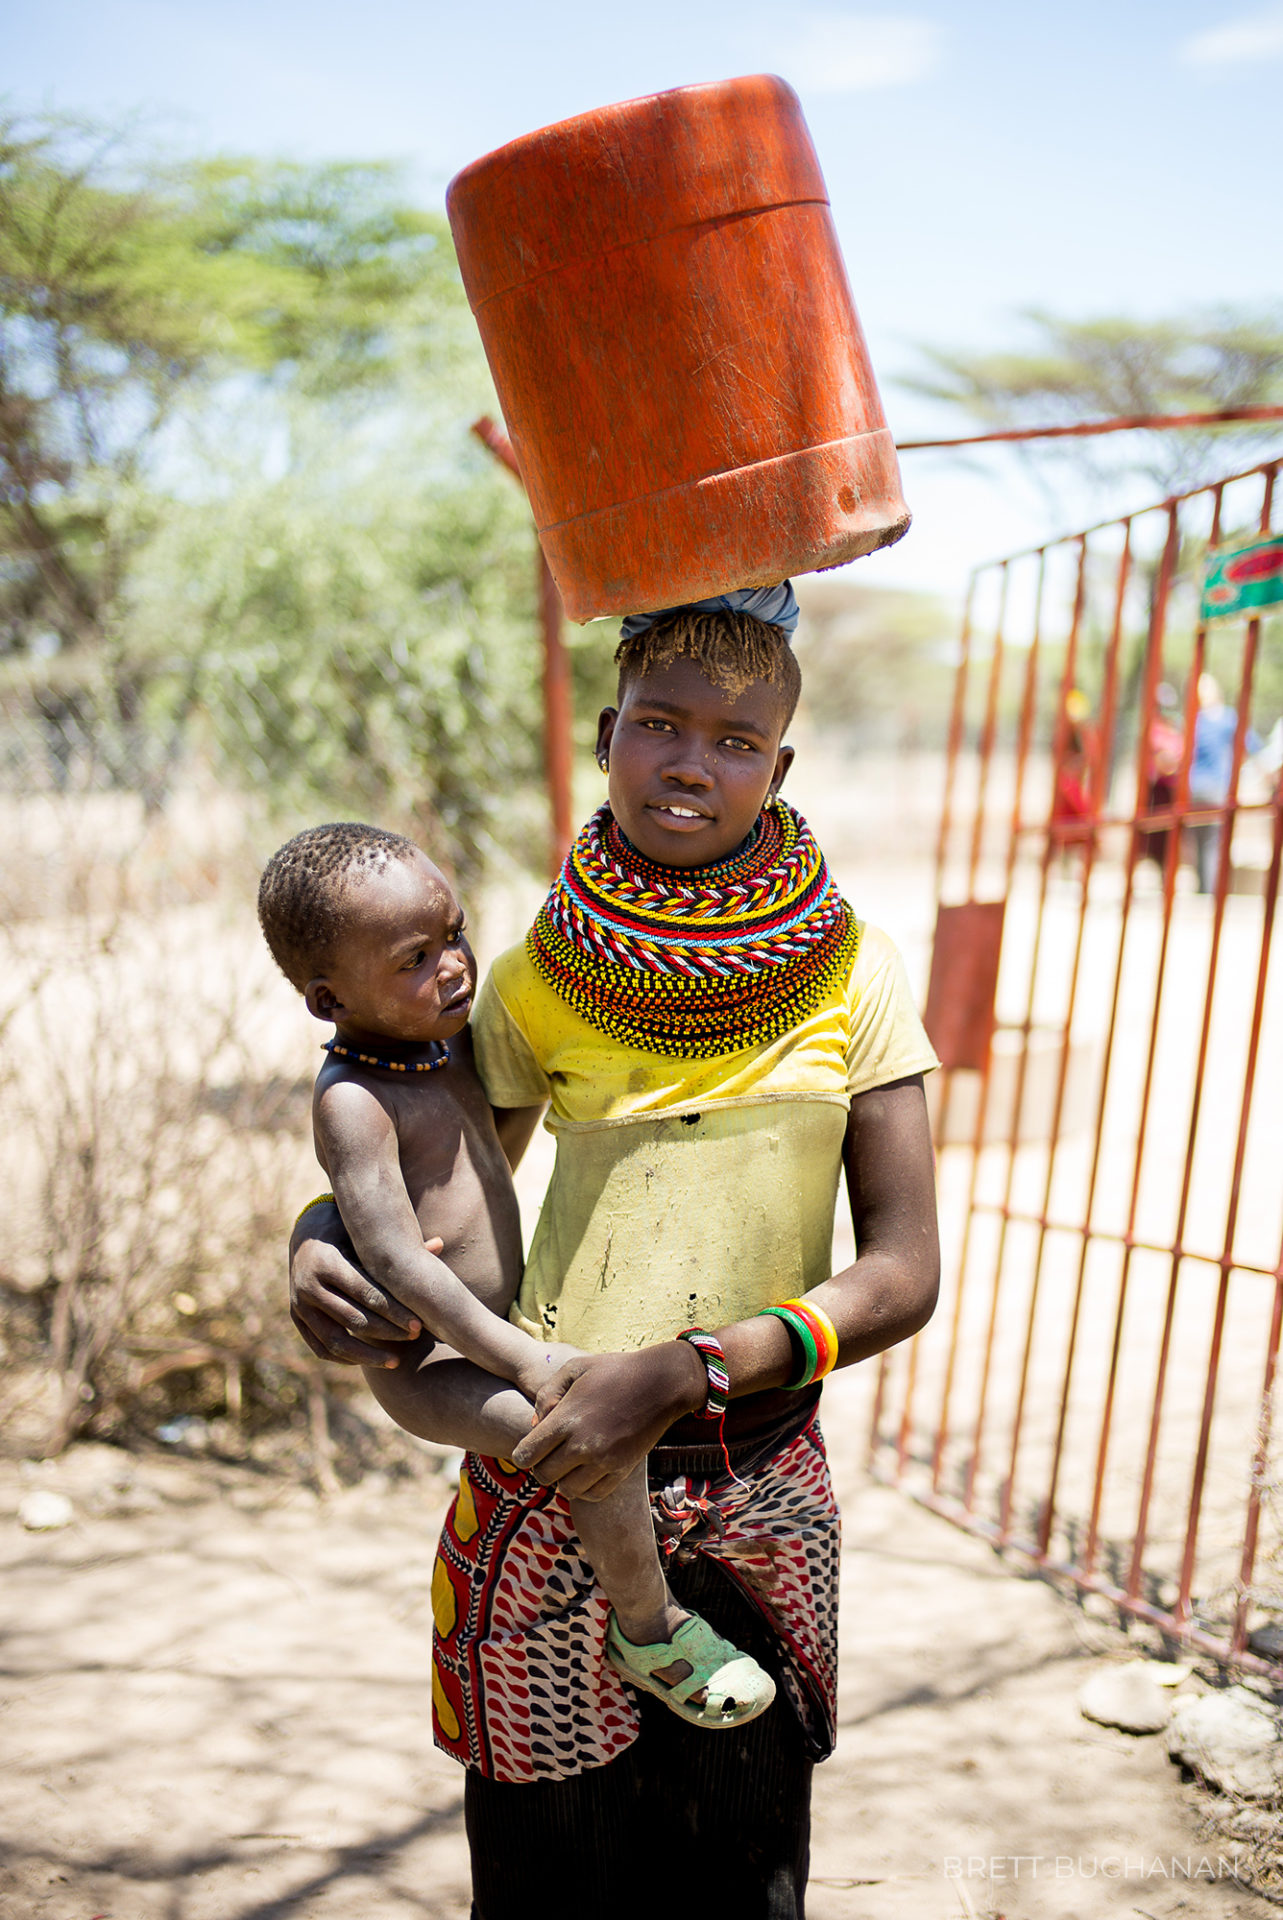 Brett-Buchanan-Kenya-water-development-NGO-29